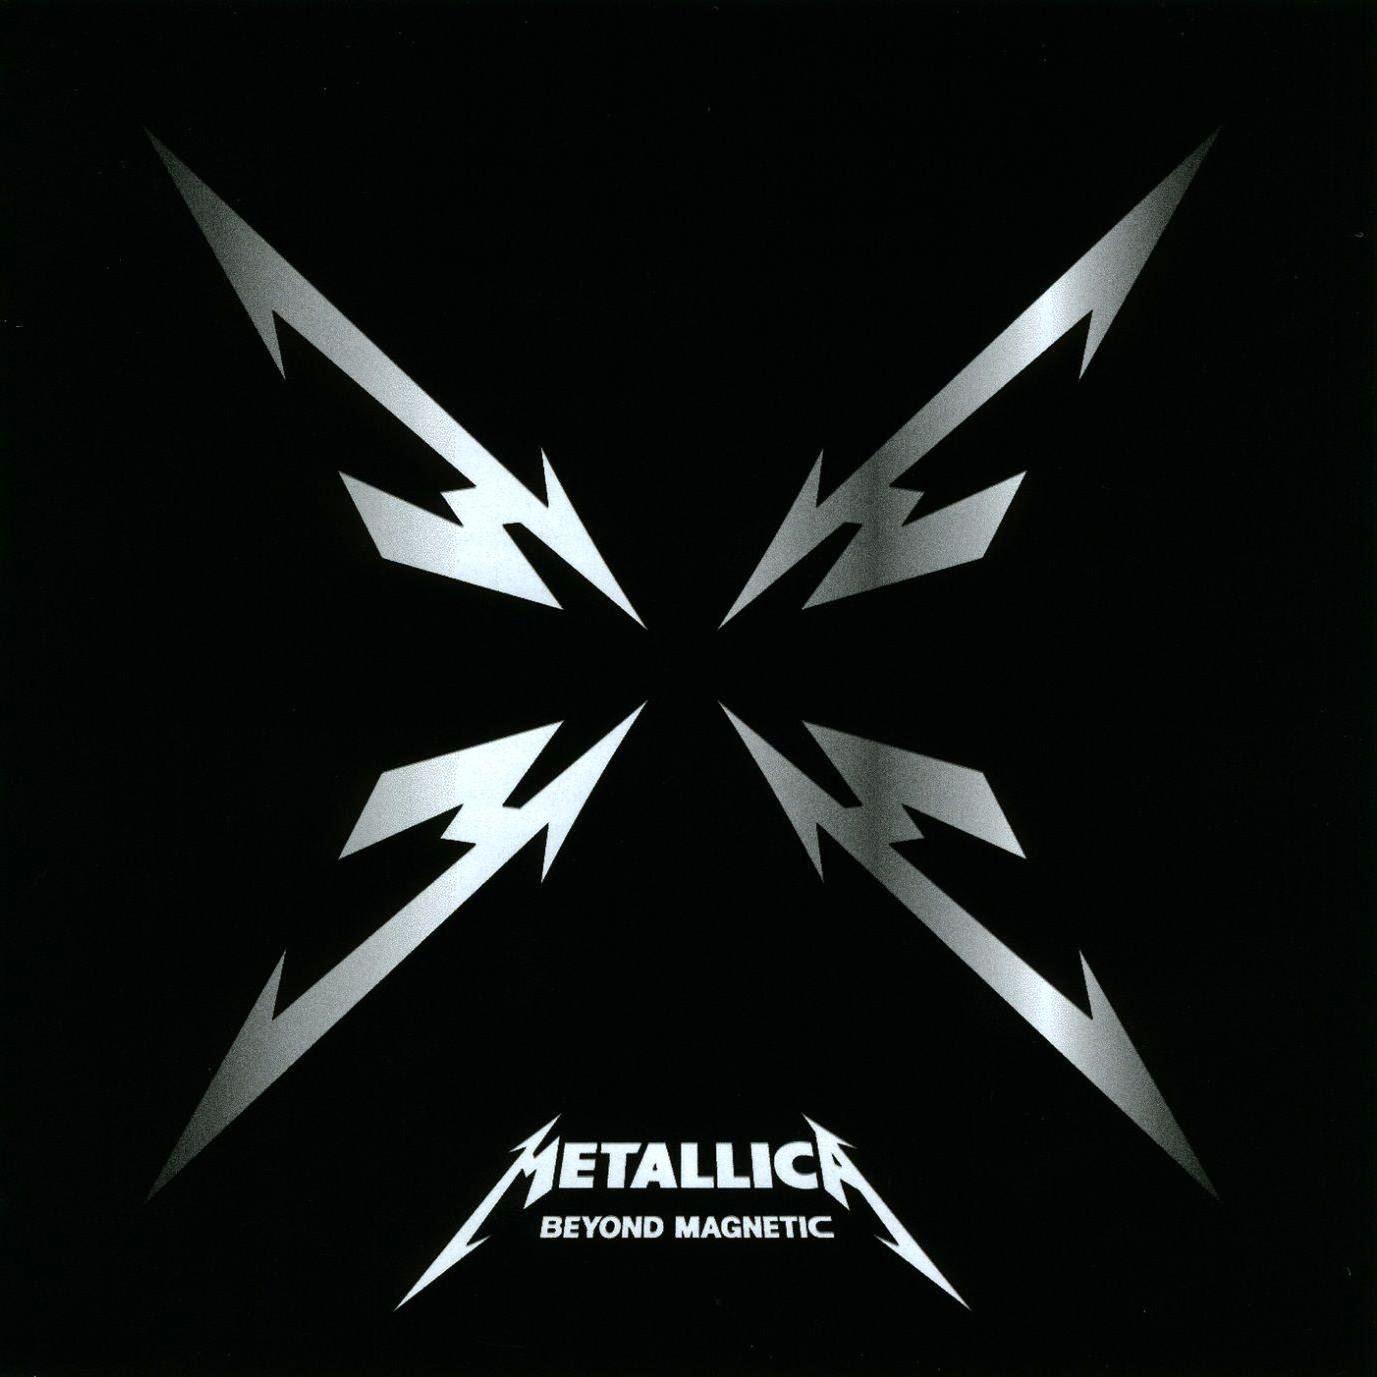 Beyond magnetic - Metallica